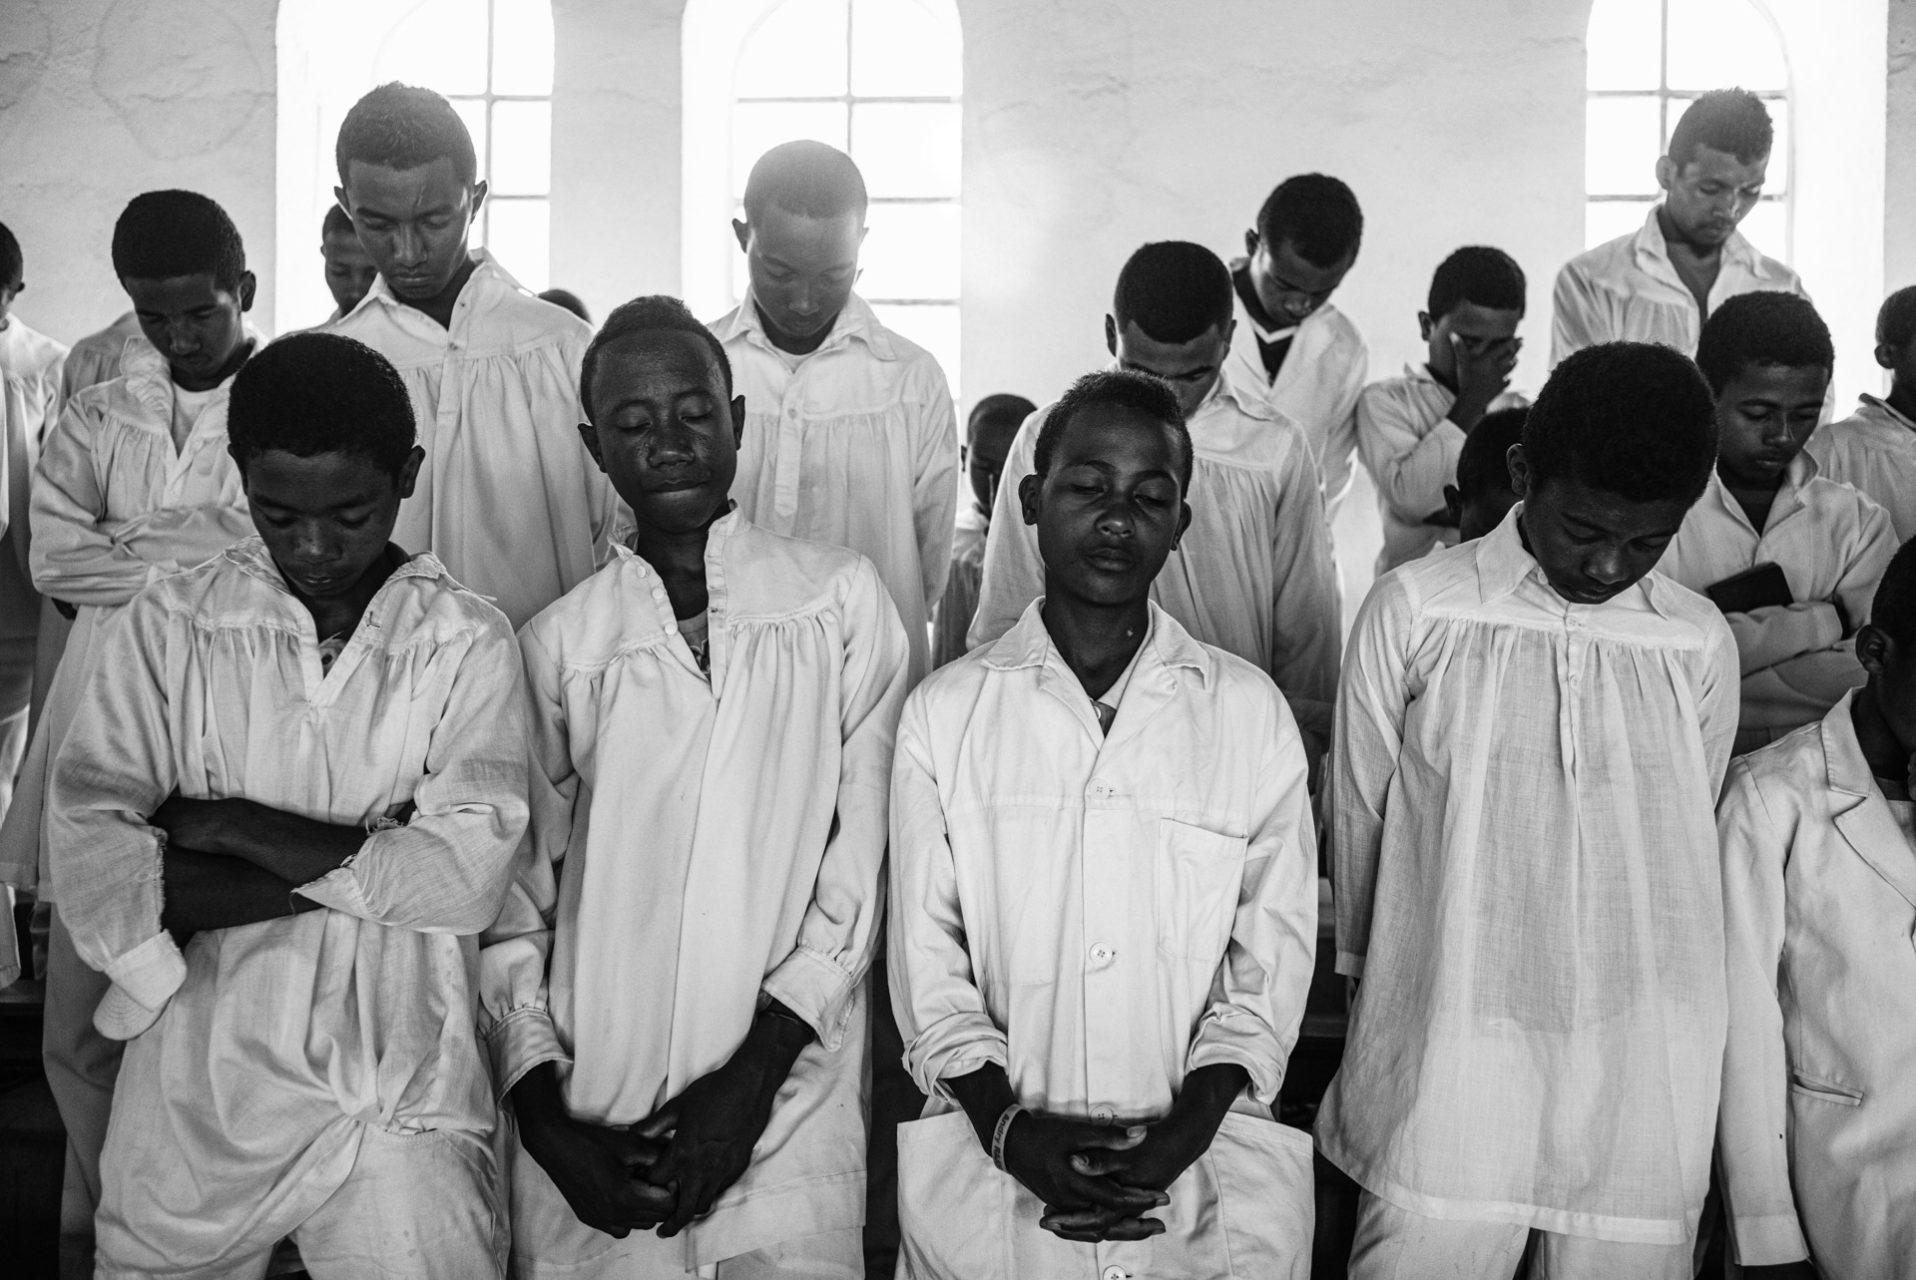 Soatanana, les Disciples du Seigneur